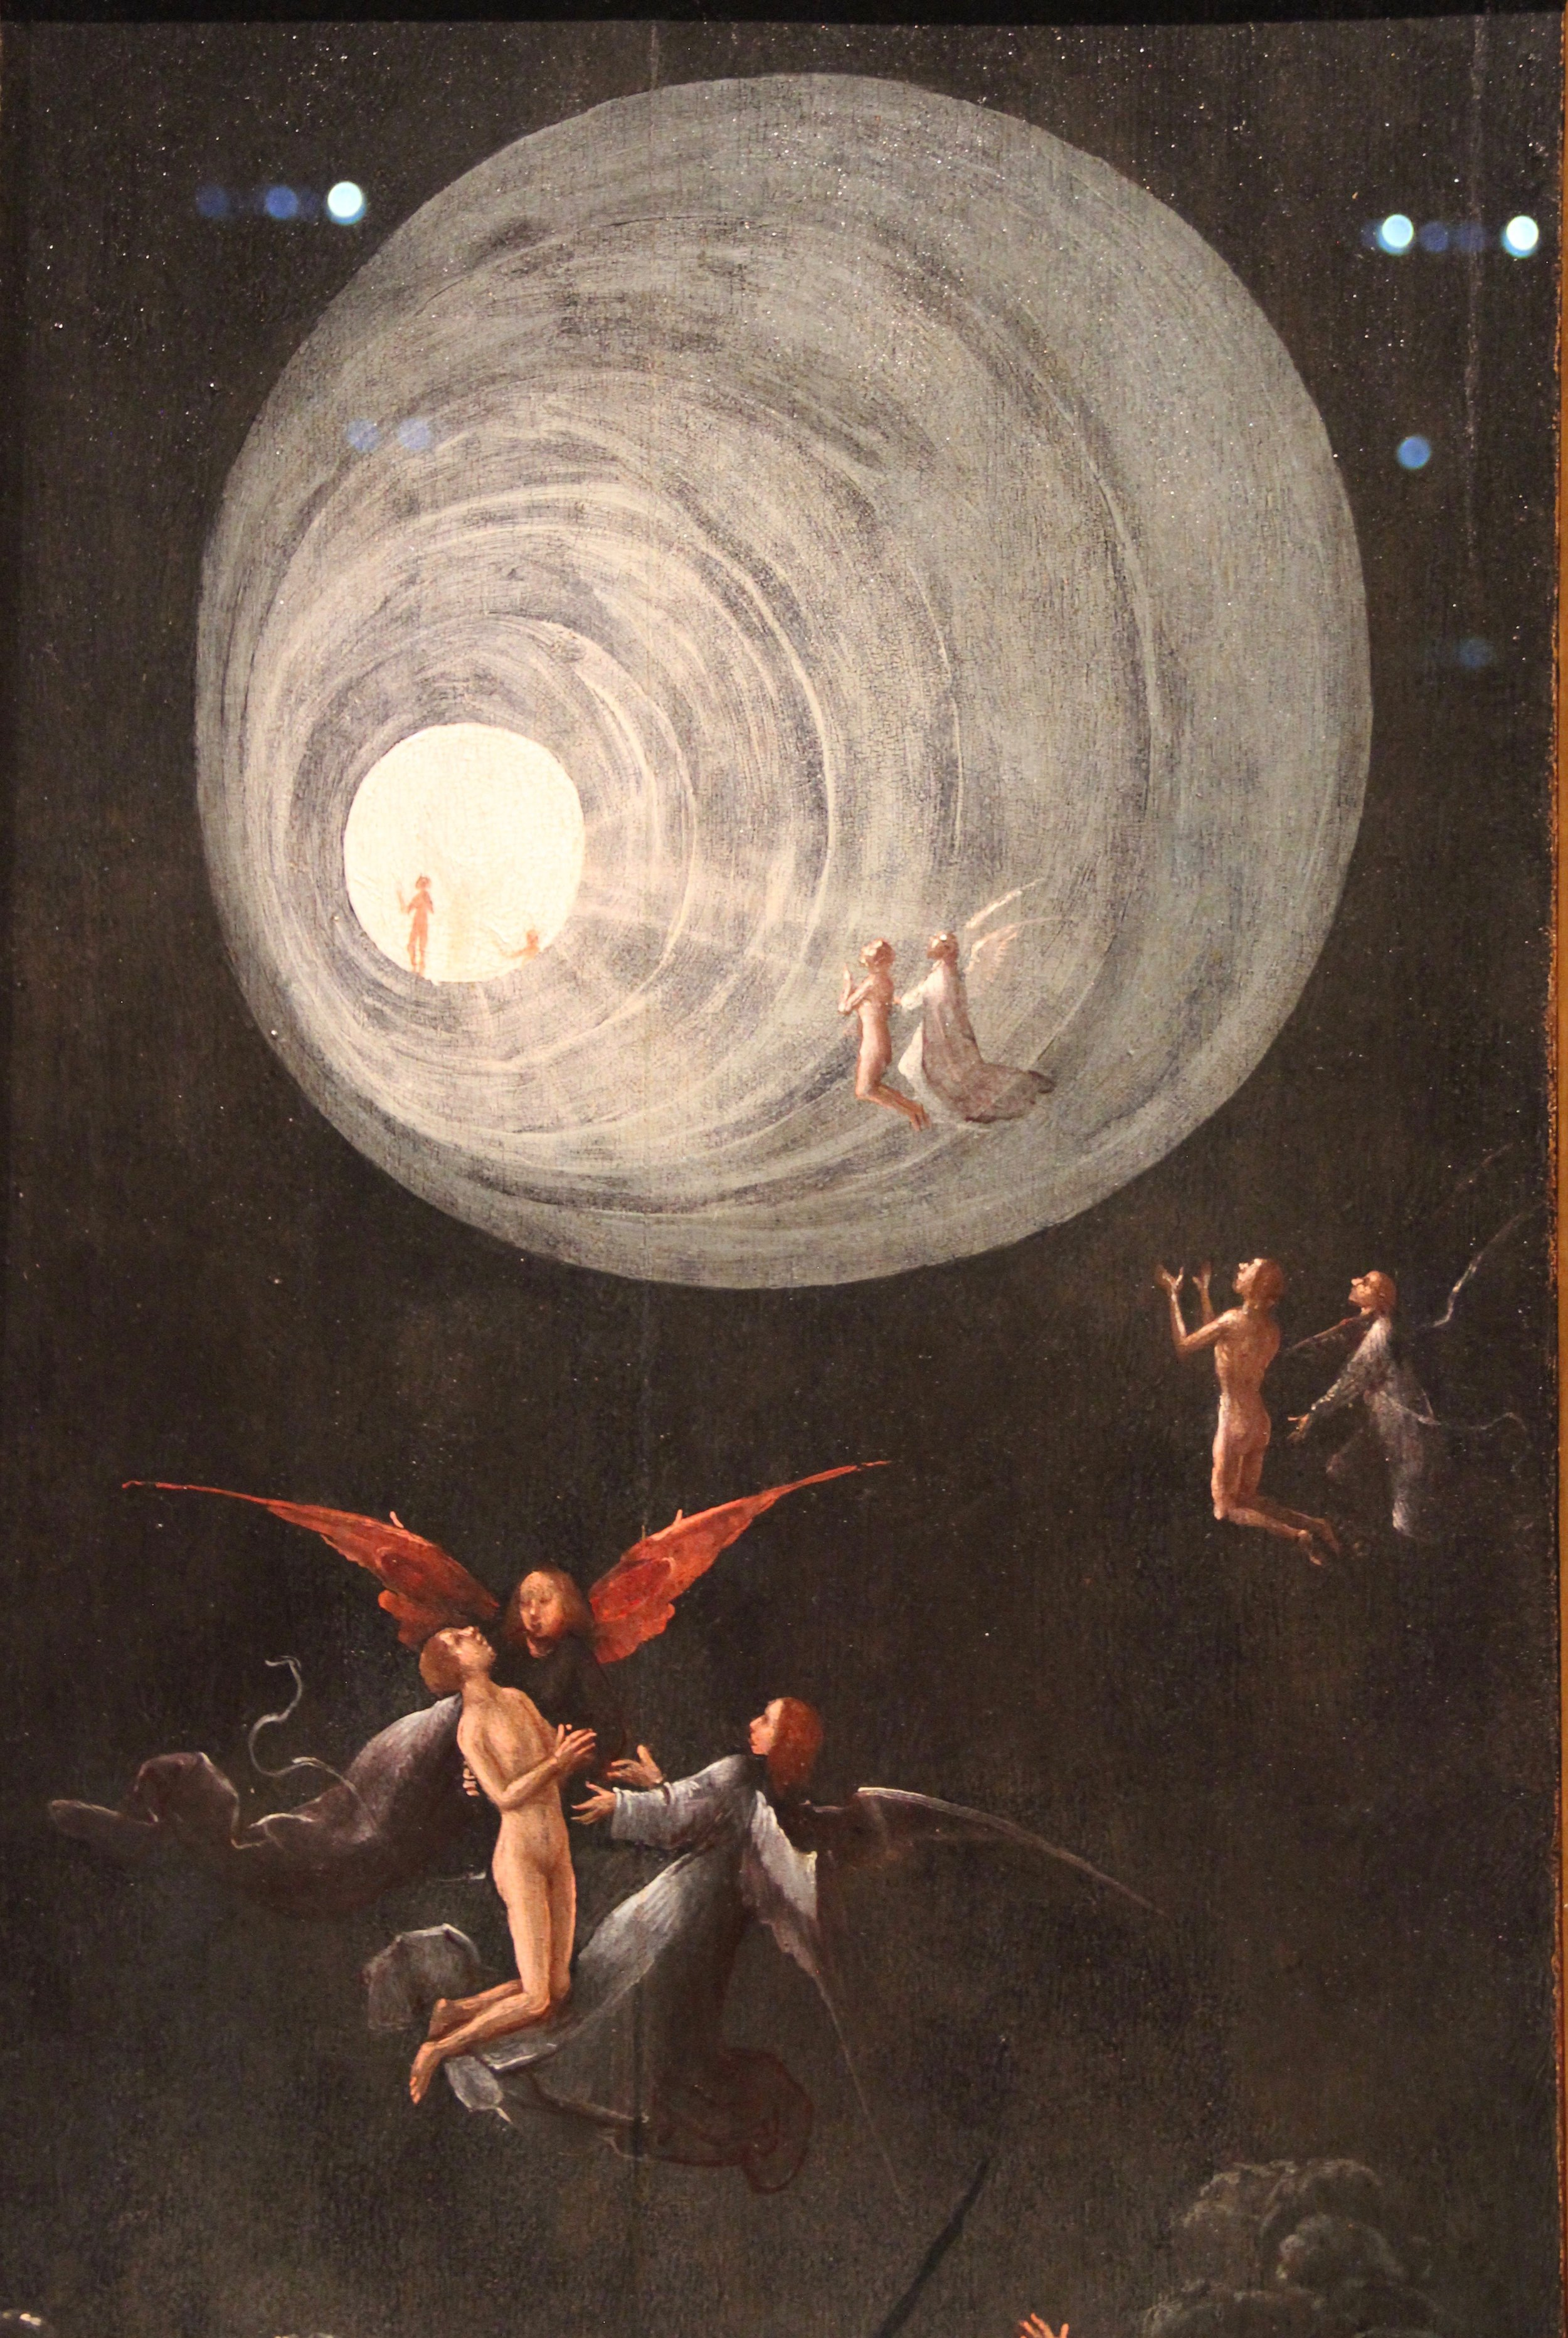 Bosch's vision